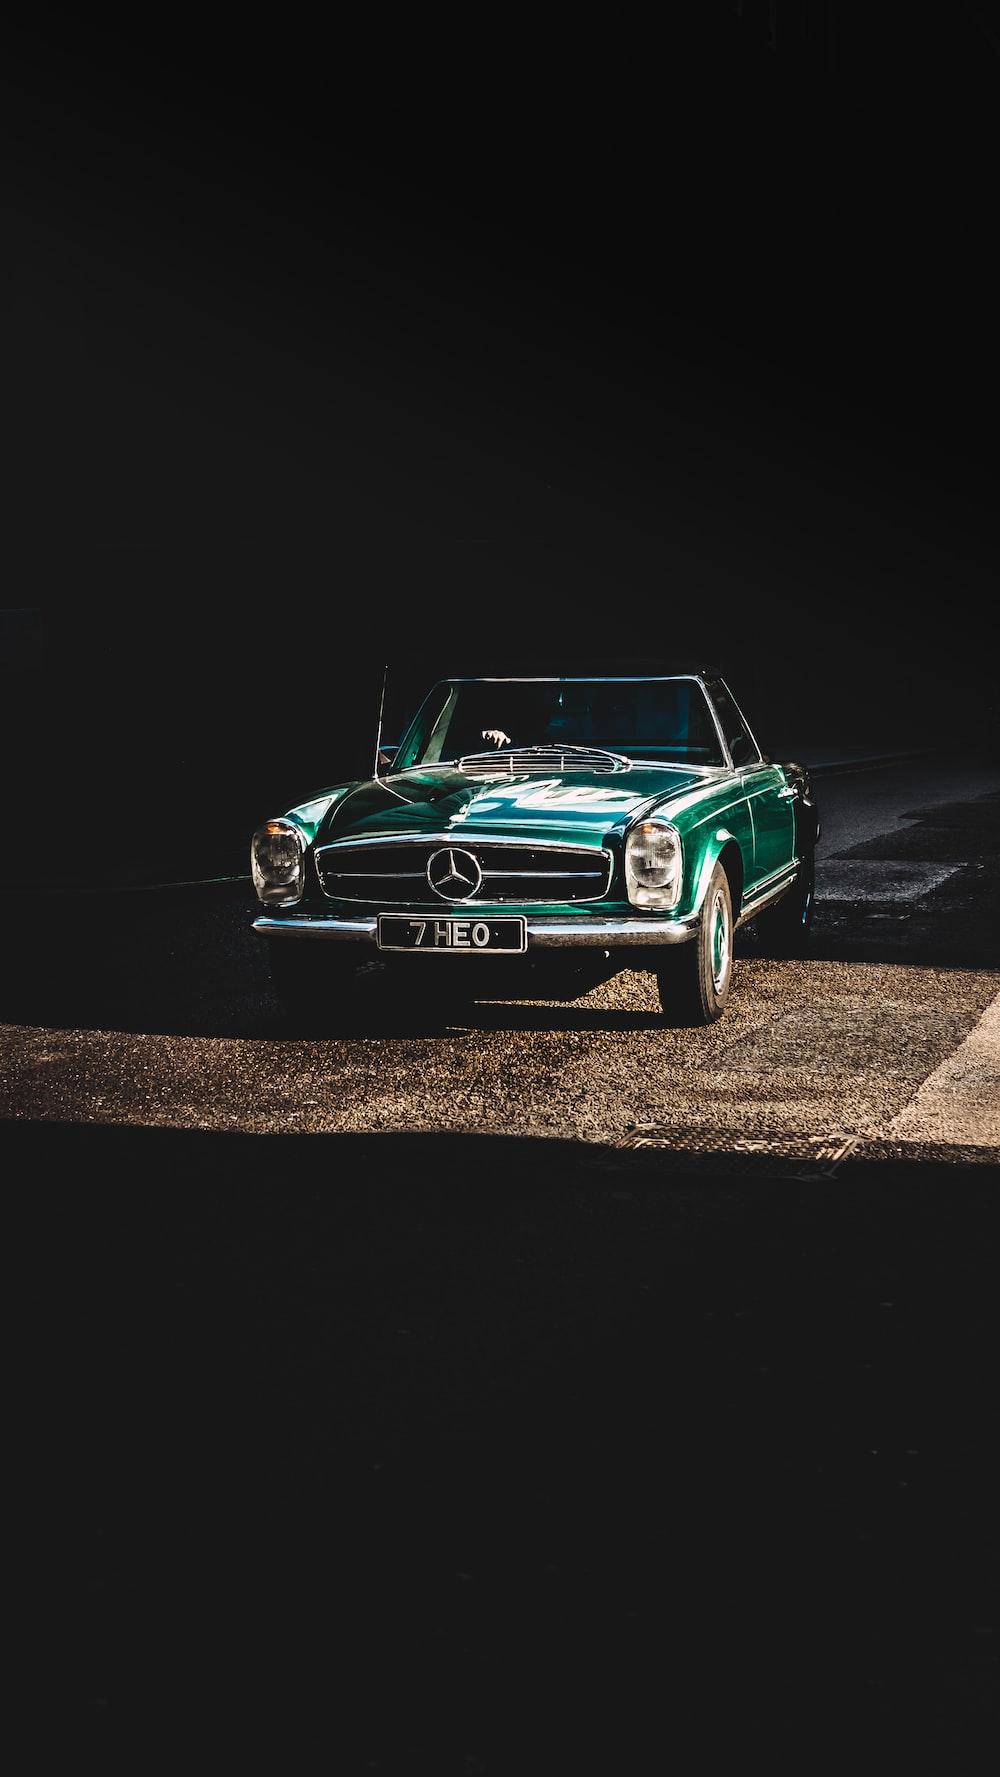 green Mercedes-Benz coupe